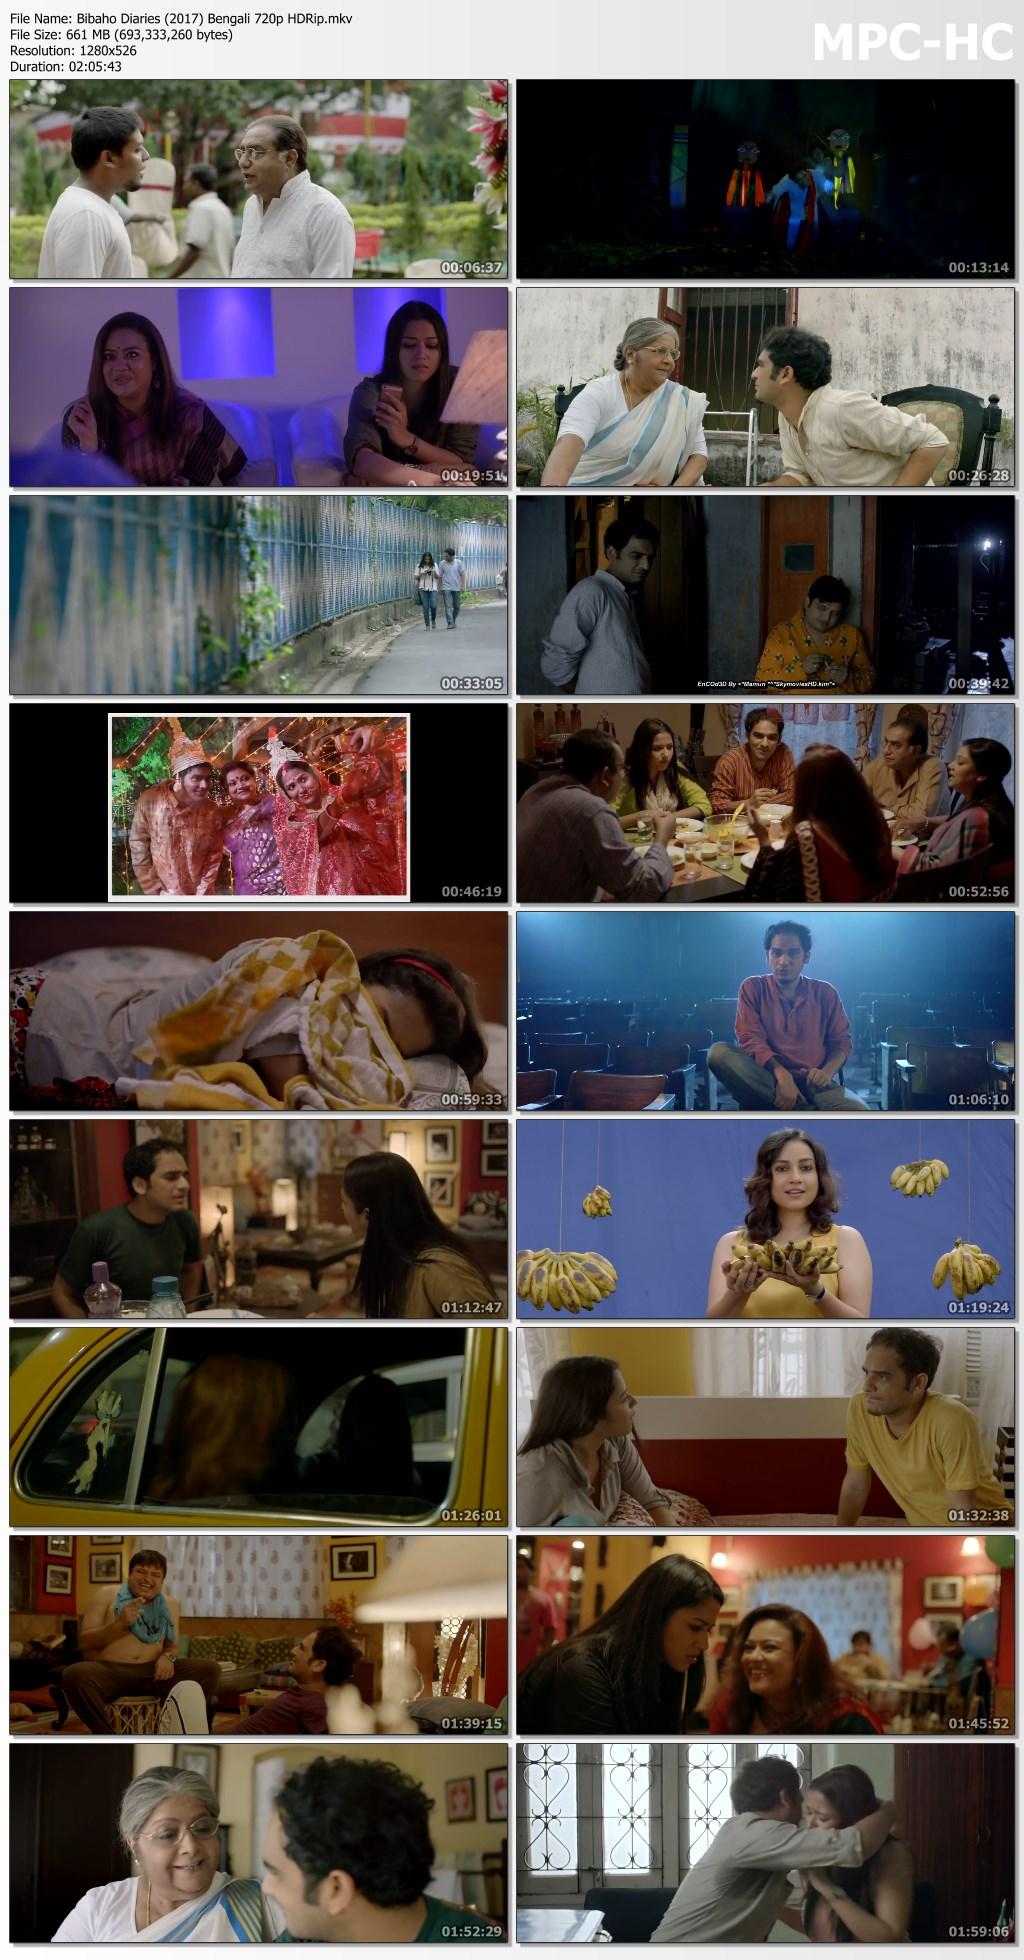 Bibaho Diaries (2017) Bengali 720p HDRip.mkv thumbs